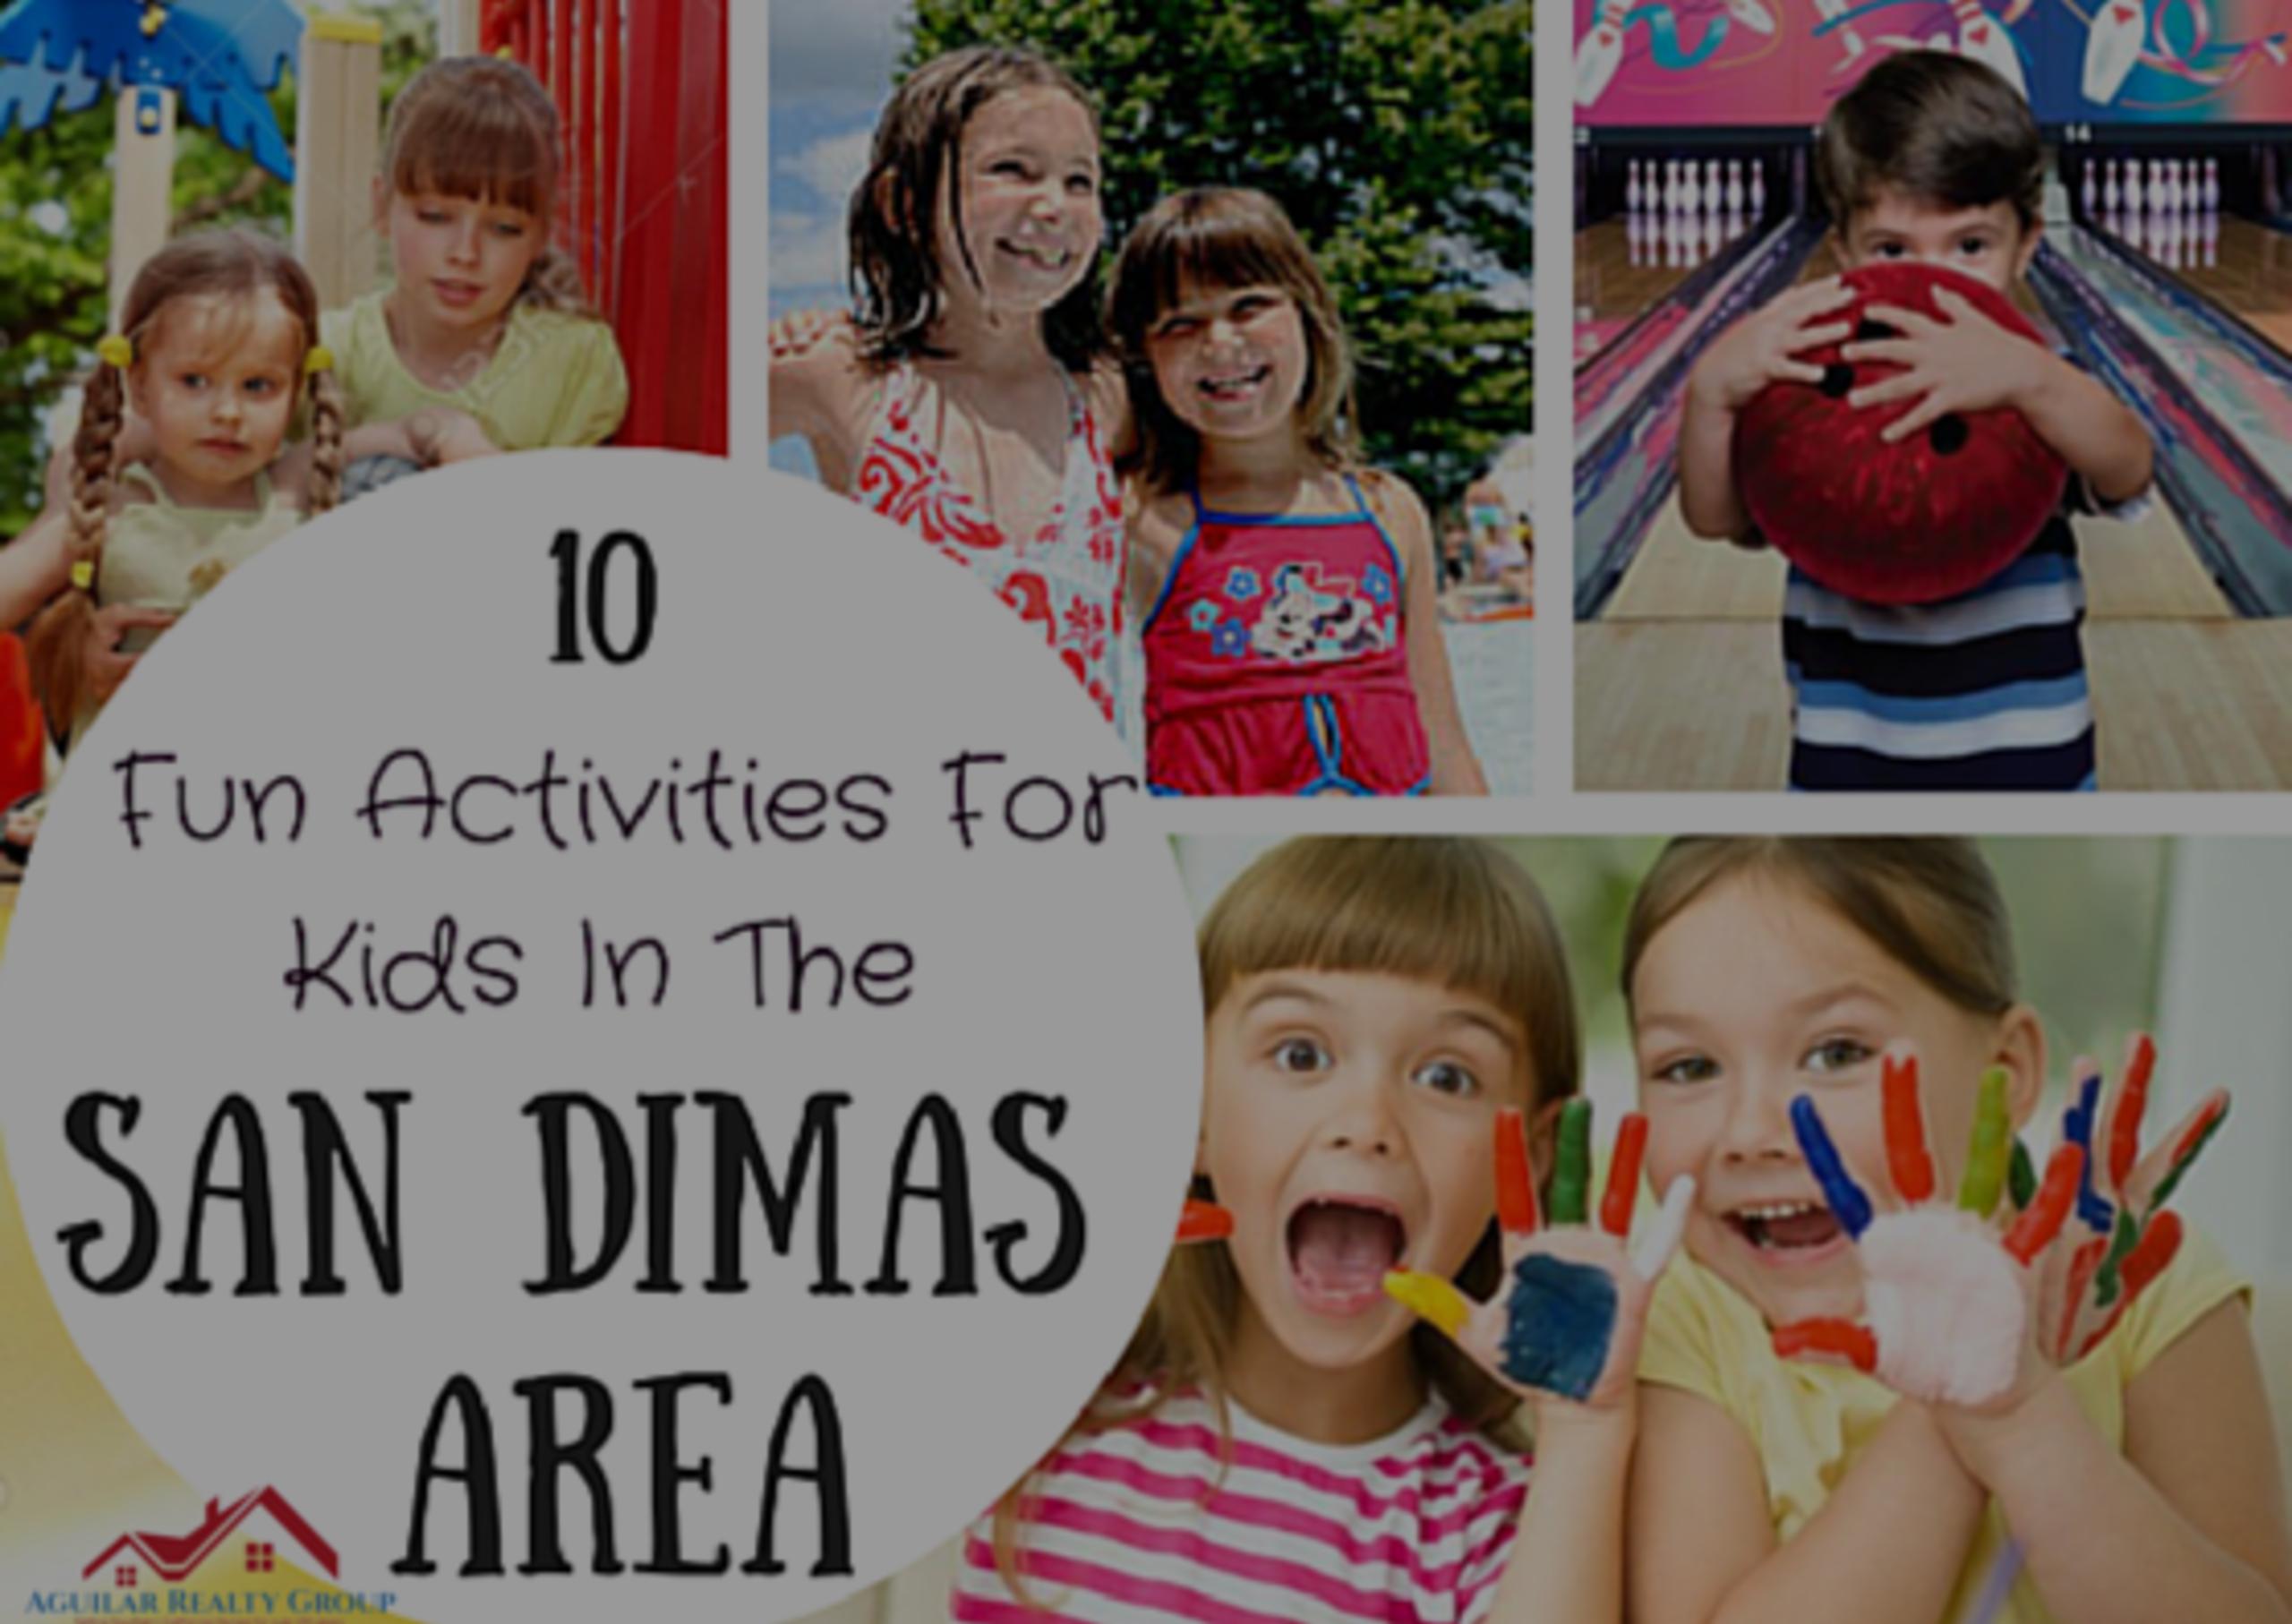 10 Fun Activities For Kids In The San Dimas Area